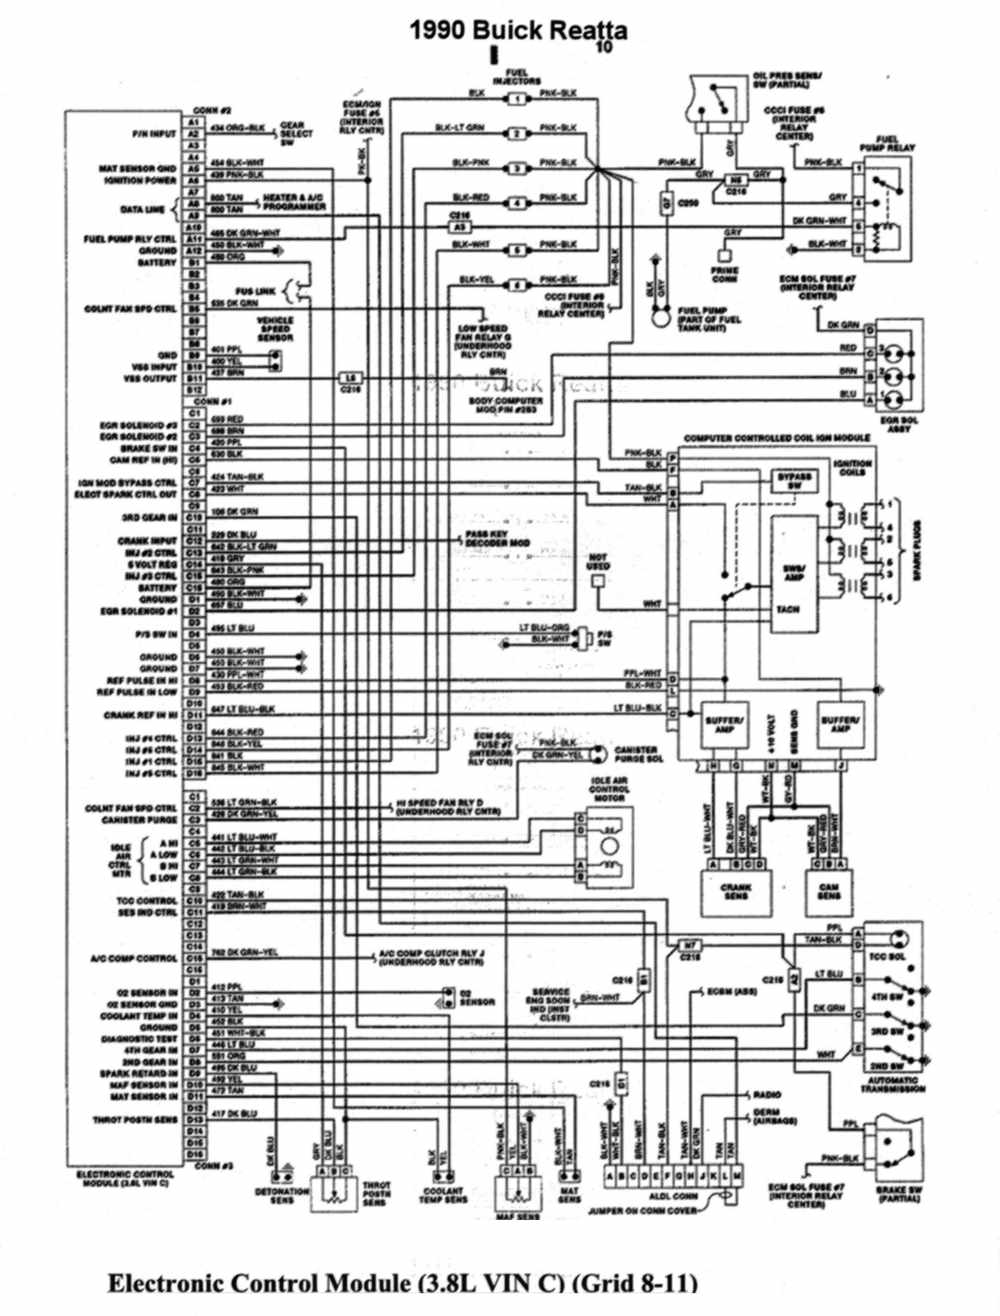 2007 buick rendezvous fuse box diagram